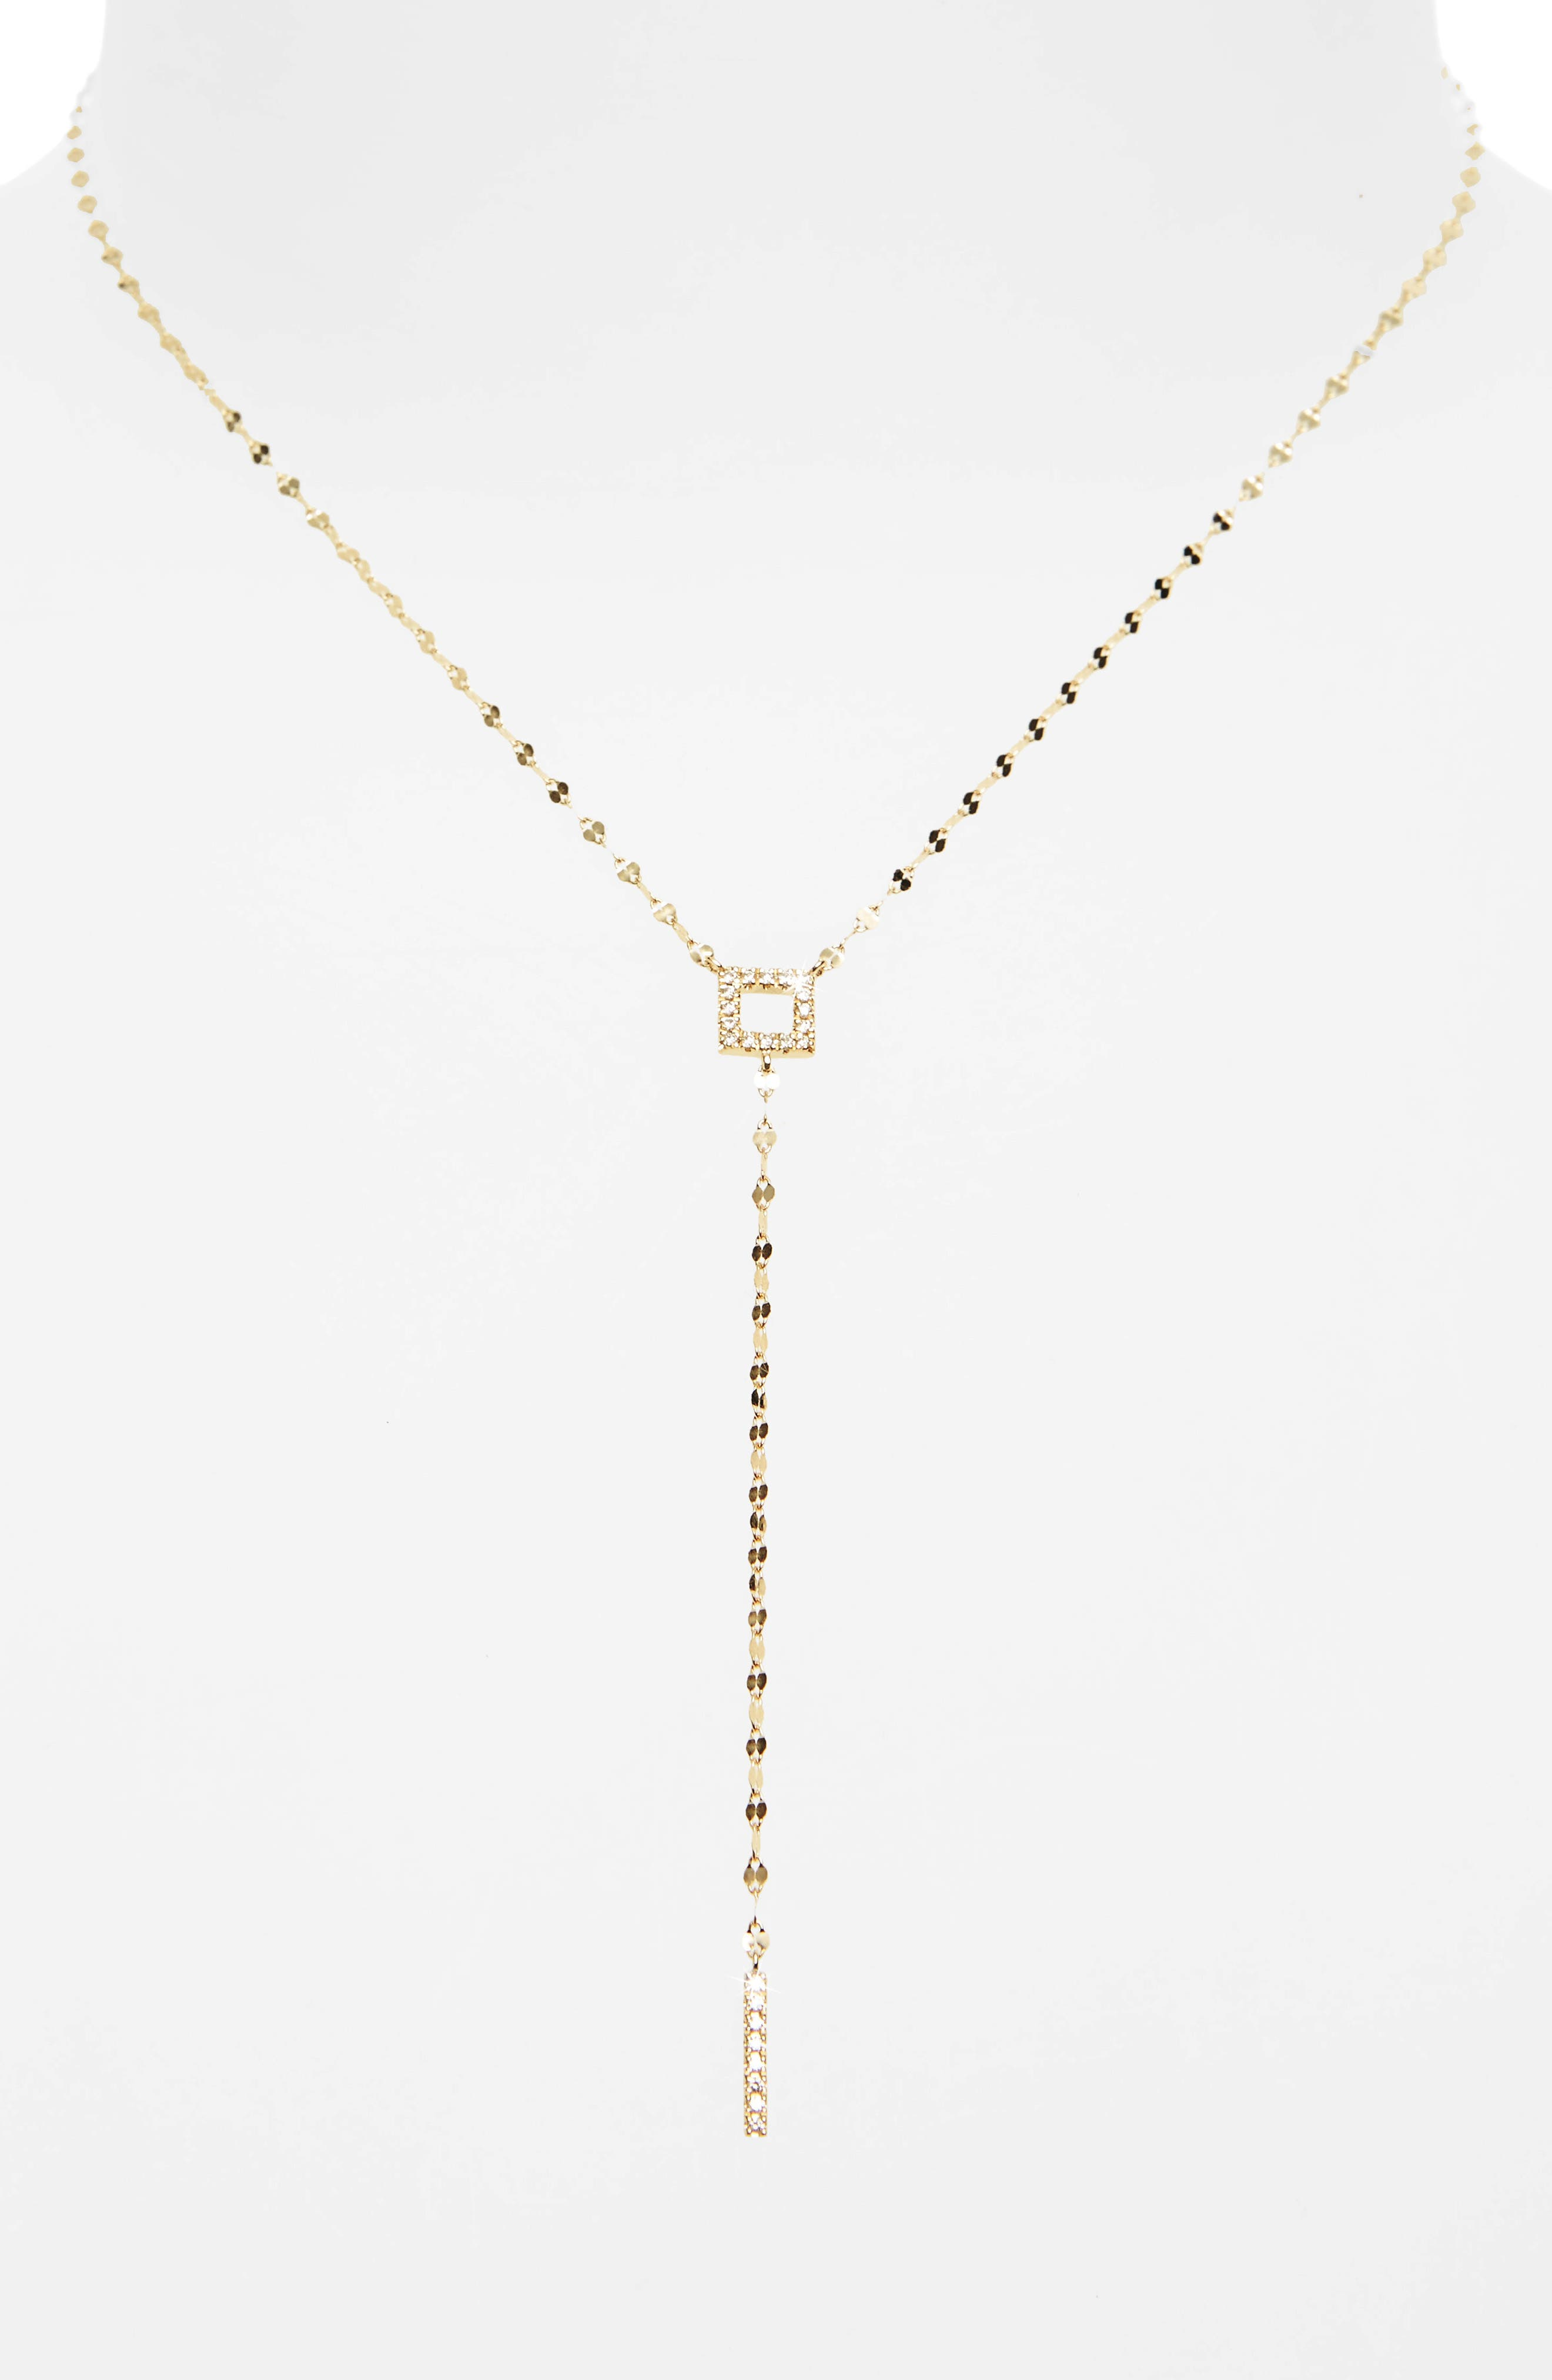 Main Image - Lana Jewelry Diamond Lariat Necklace